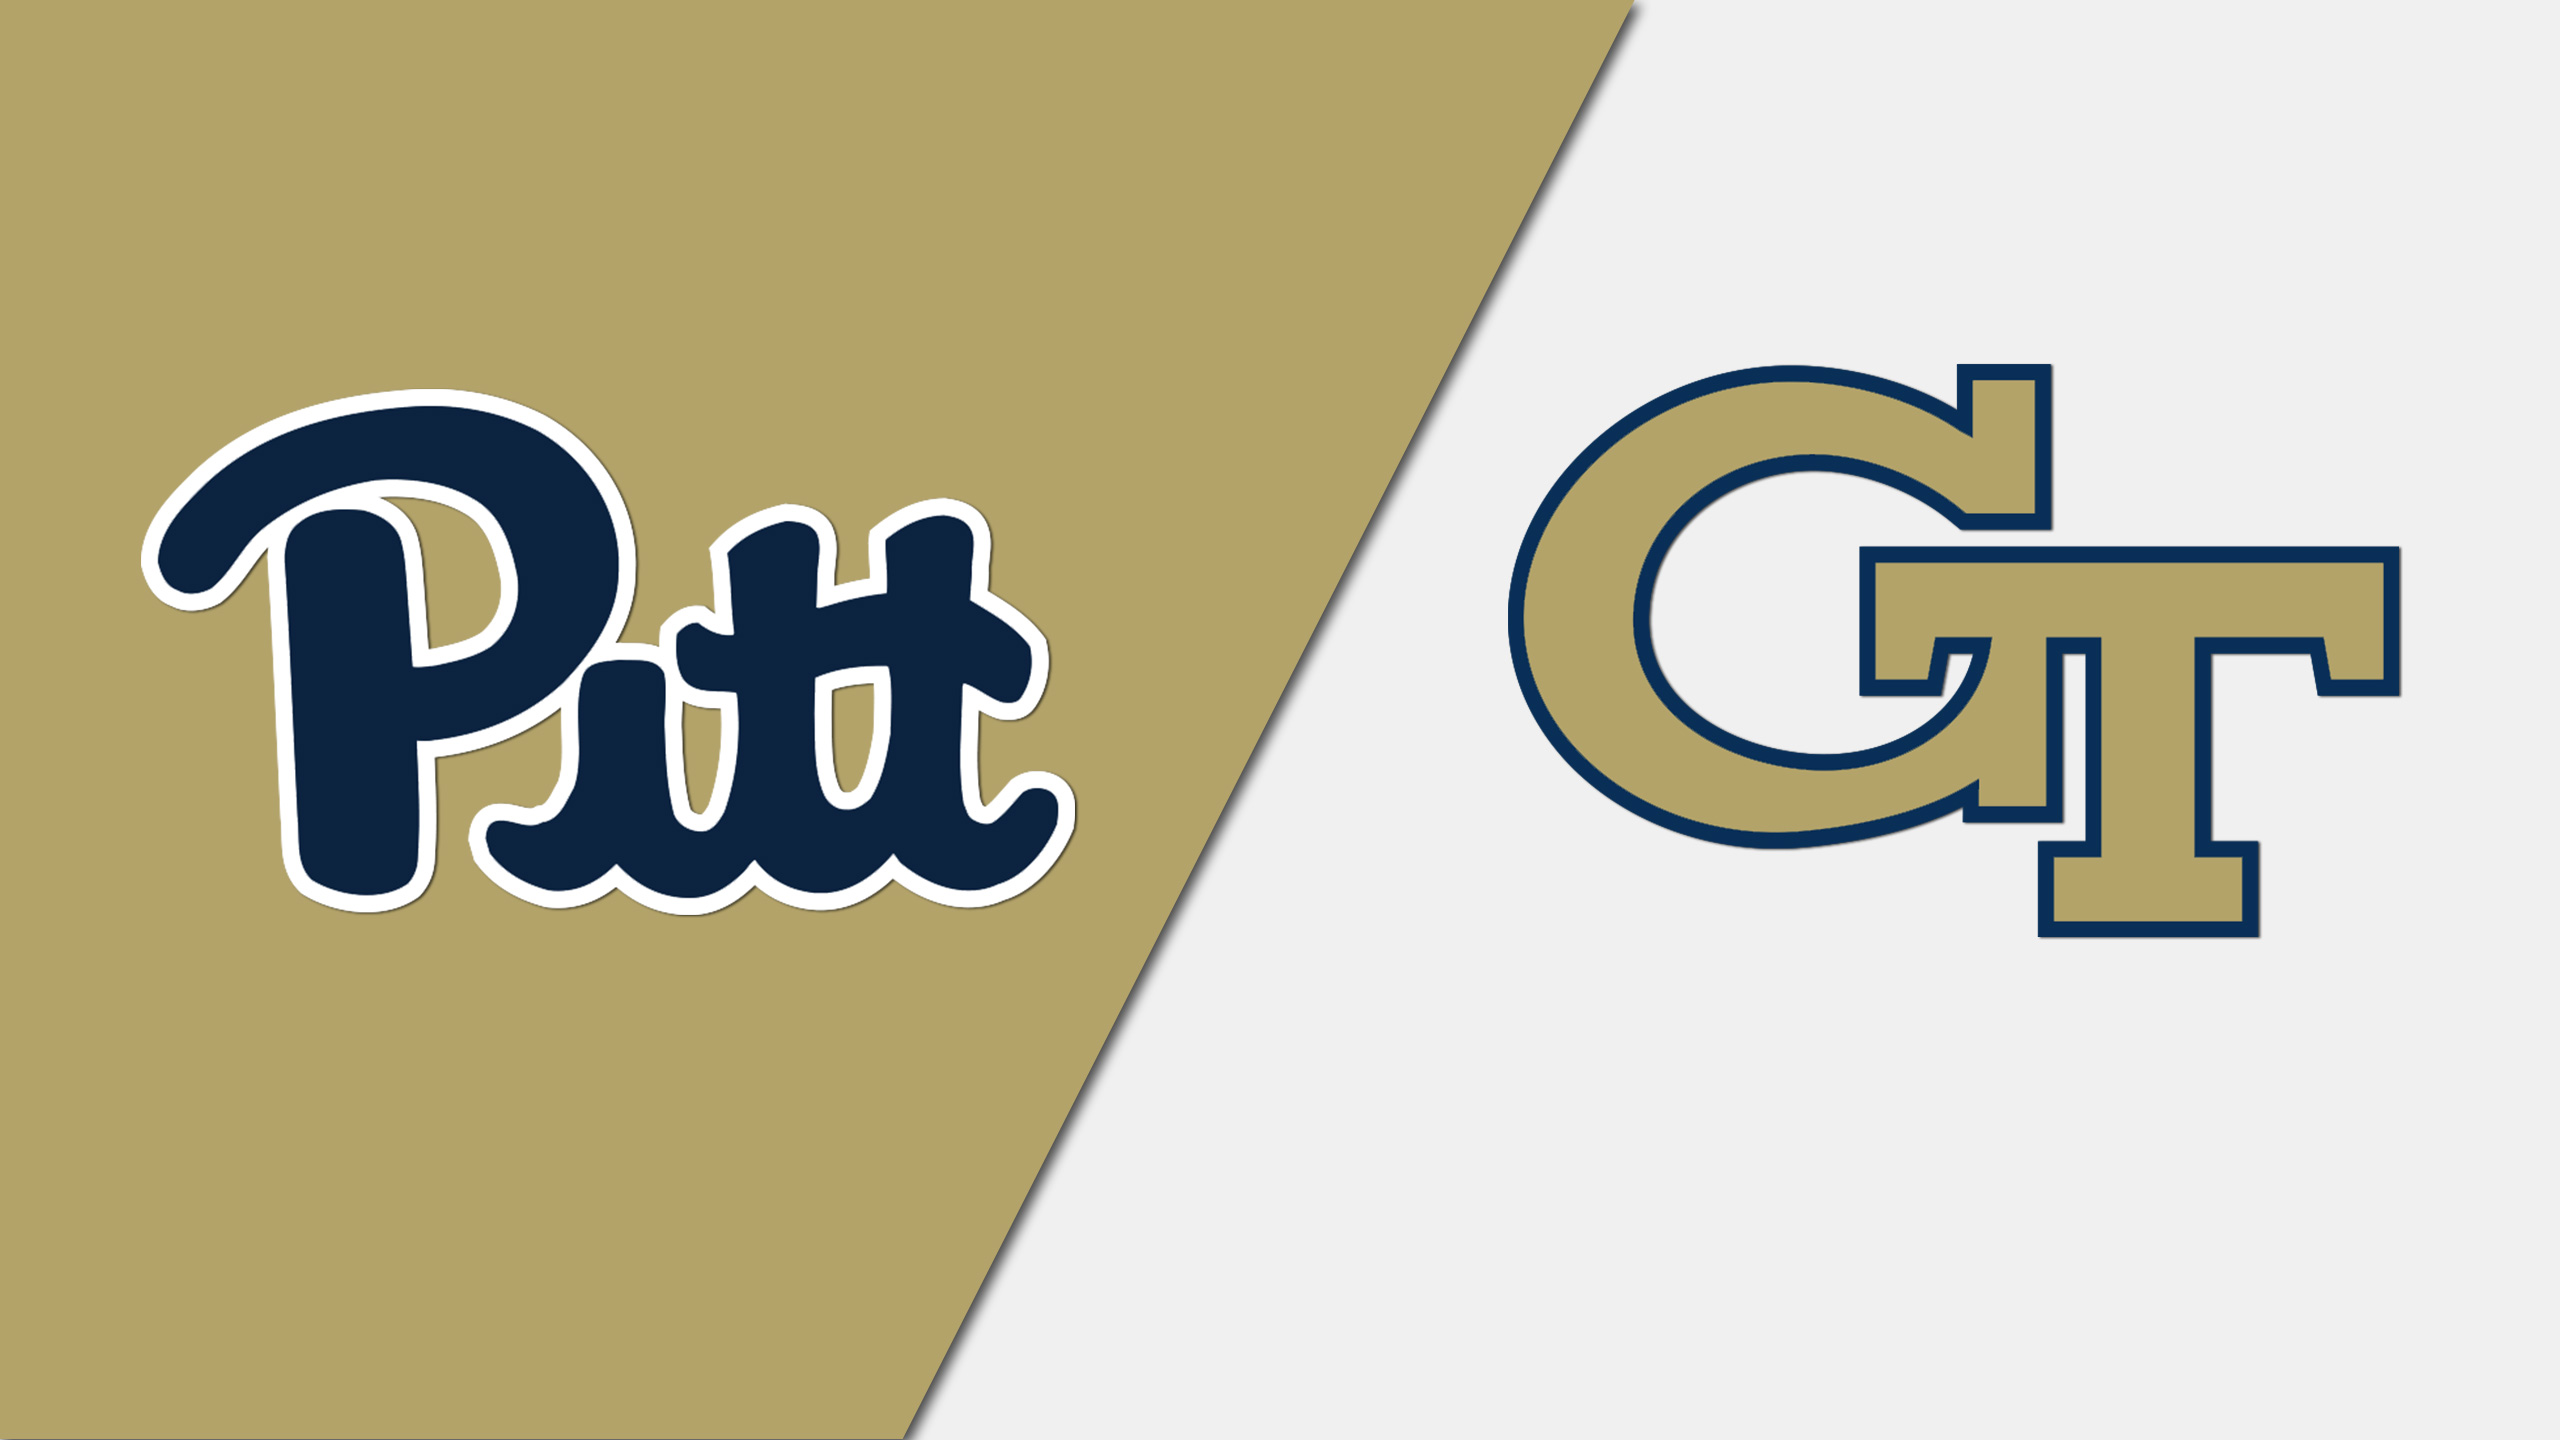 Pittsburgh vs. Georgia Tech